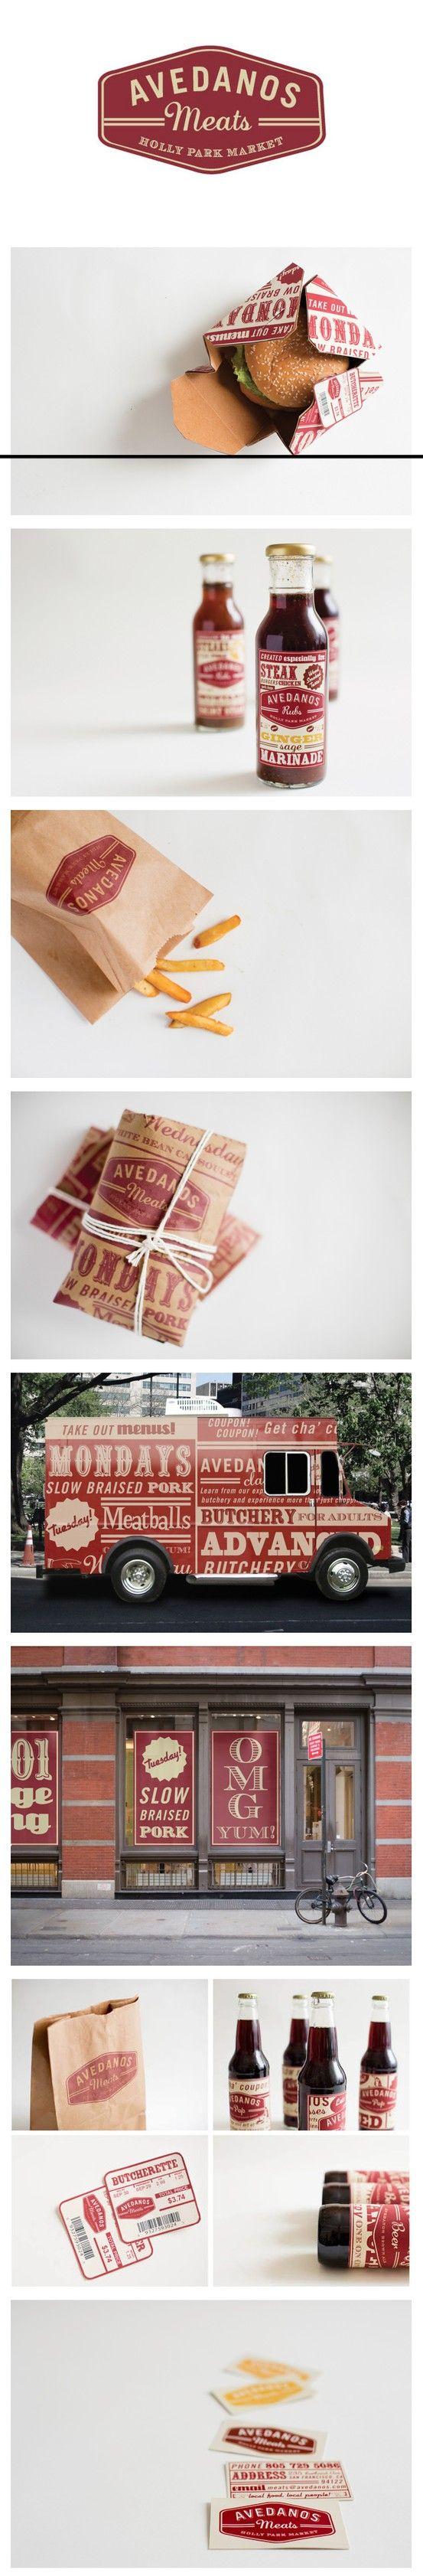 Avedando's Meat #identity #packaging #branding #marketing PD